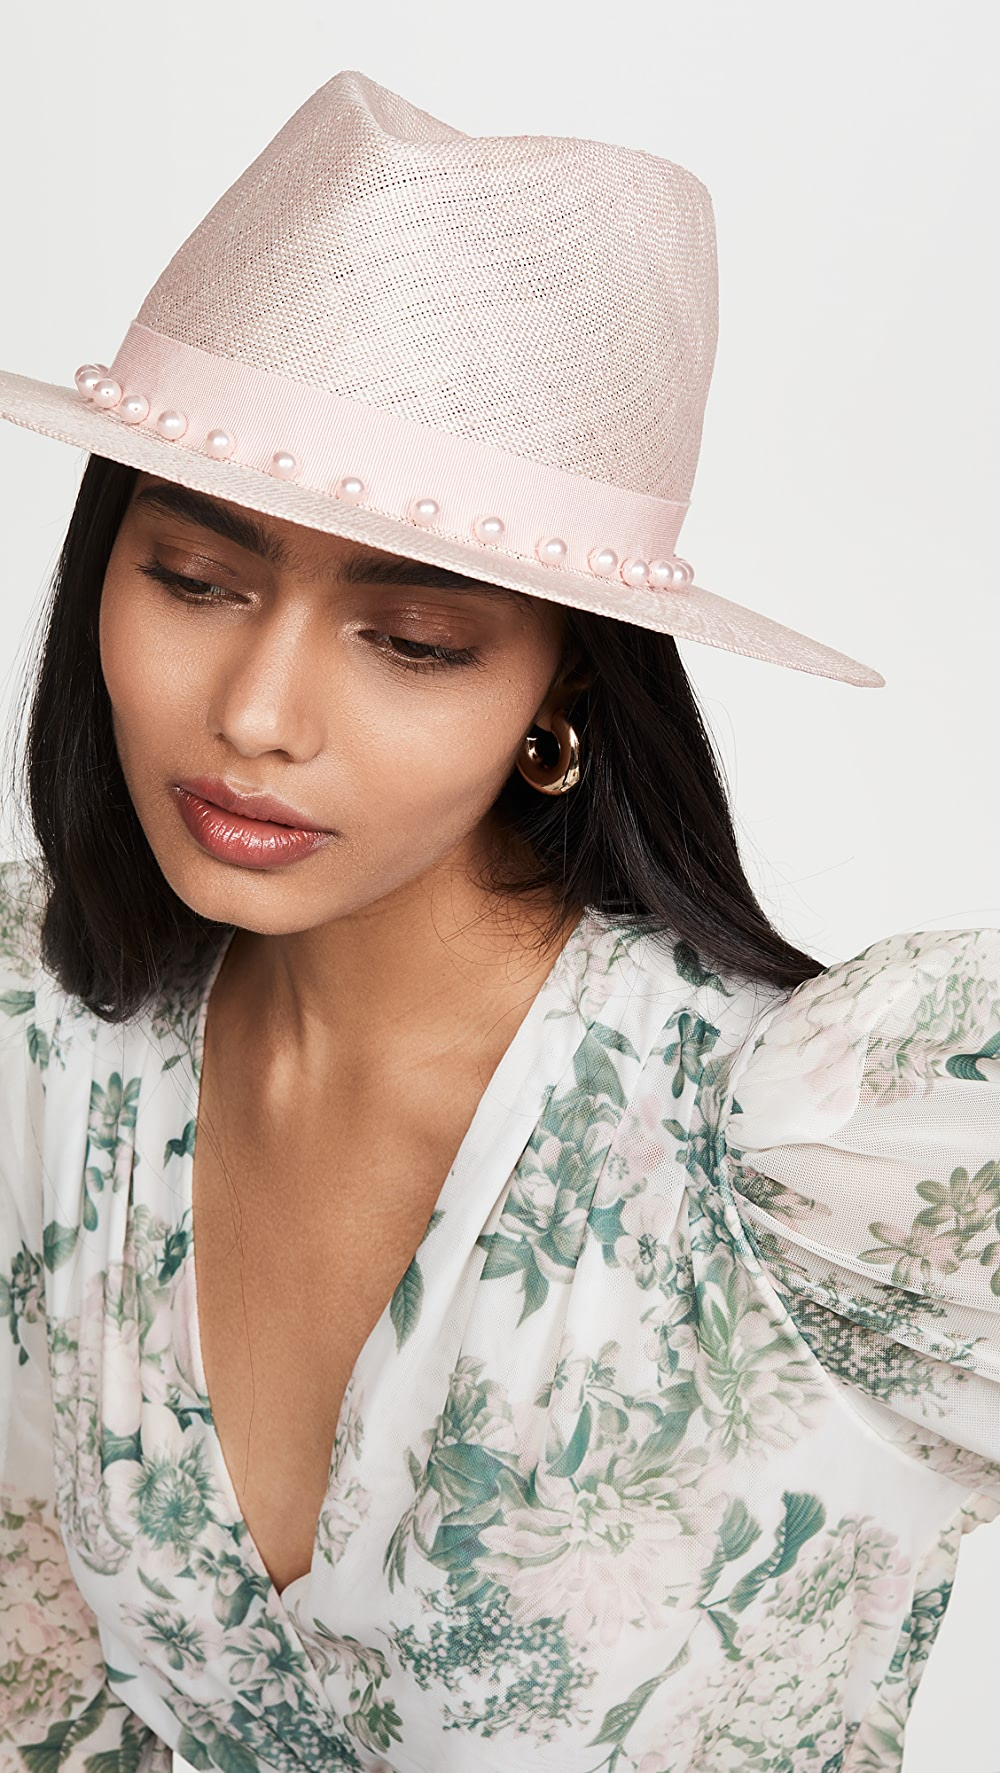 Beautiful Eugenia Kim - Blaine Hat To Win A High Admiration